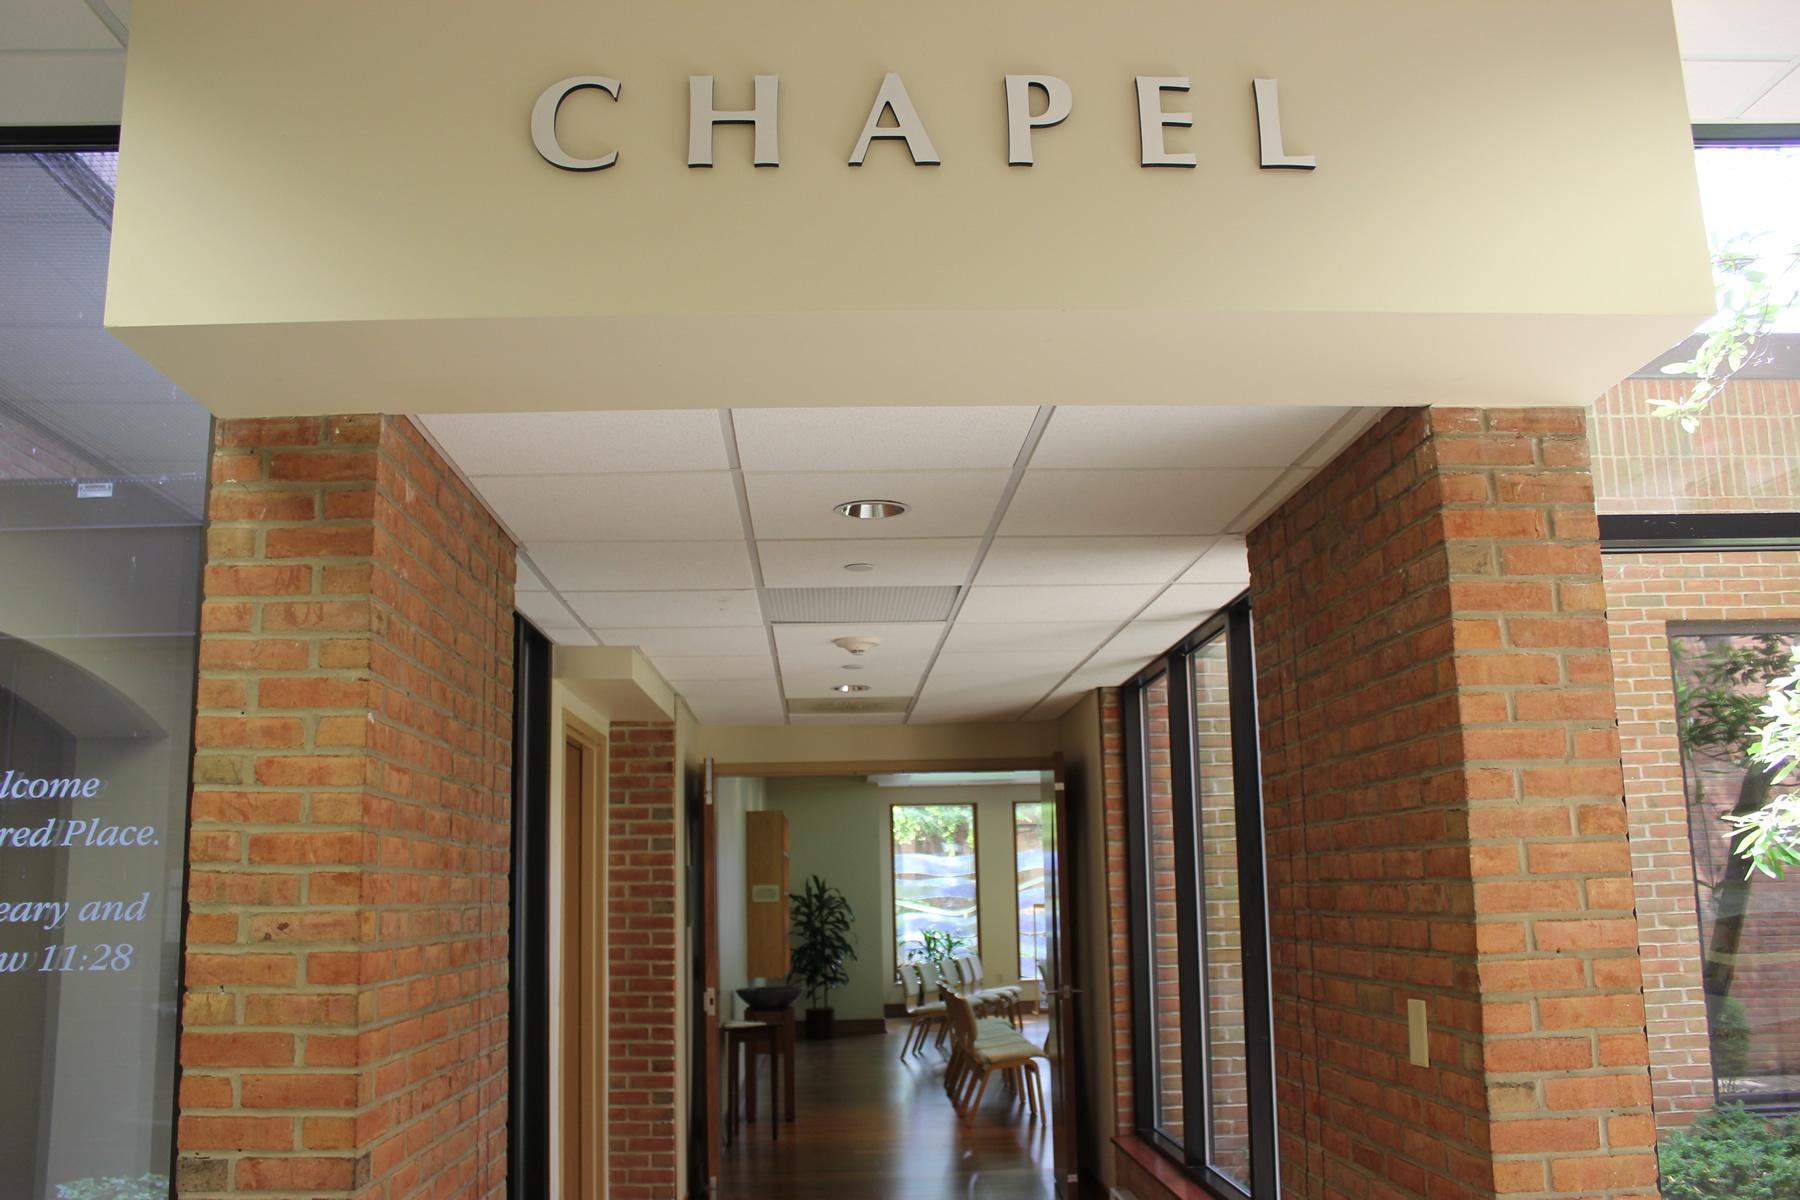 https://www.kficontractors.com/wp-content/uploads/2015/05/Clermont-Mercy-Hospital-Chapel-5-e1557900978158.jpg